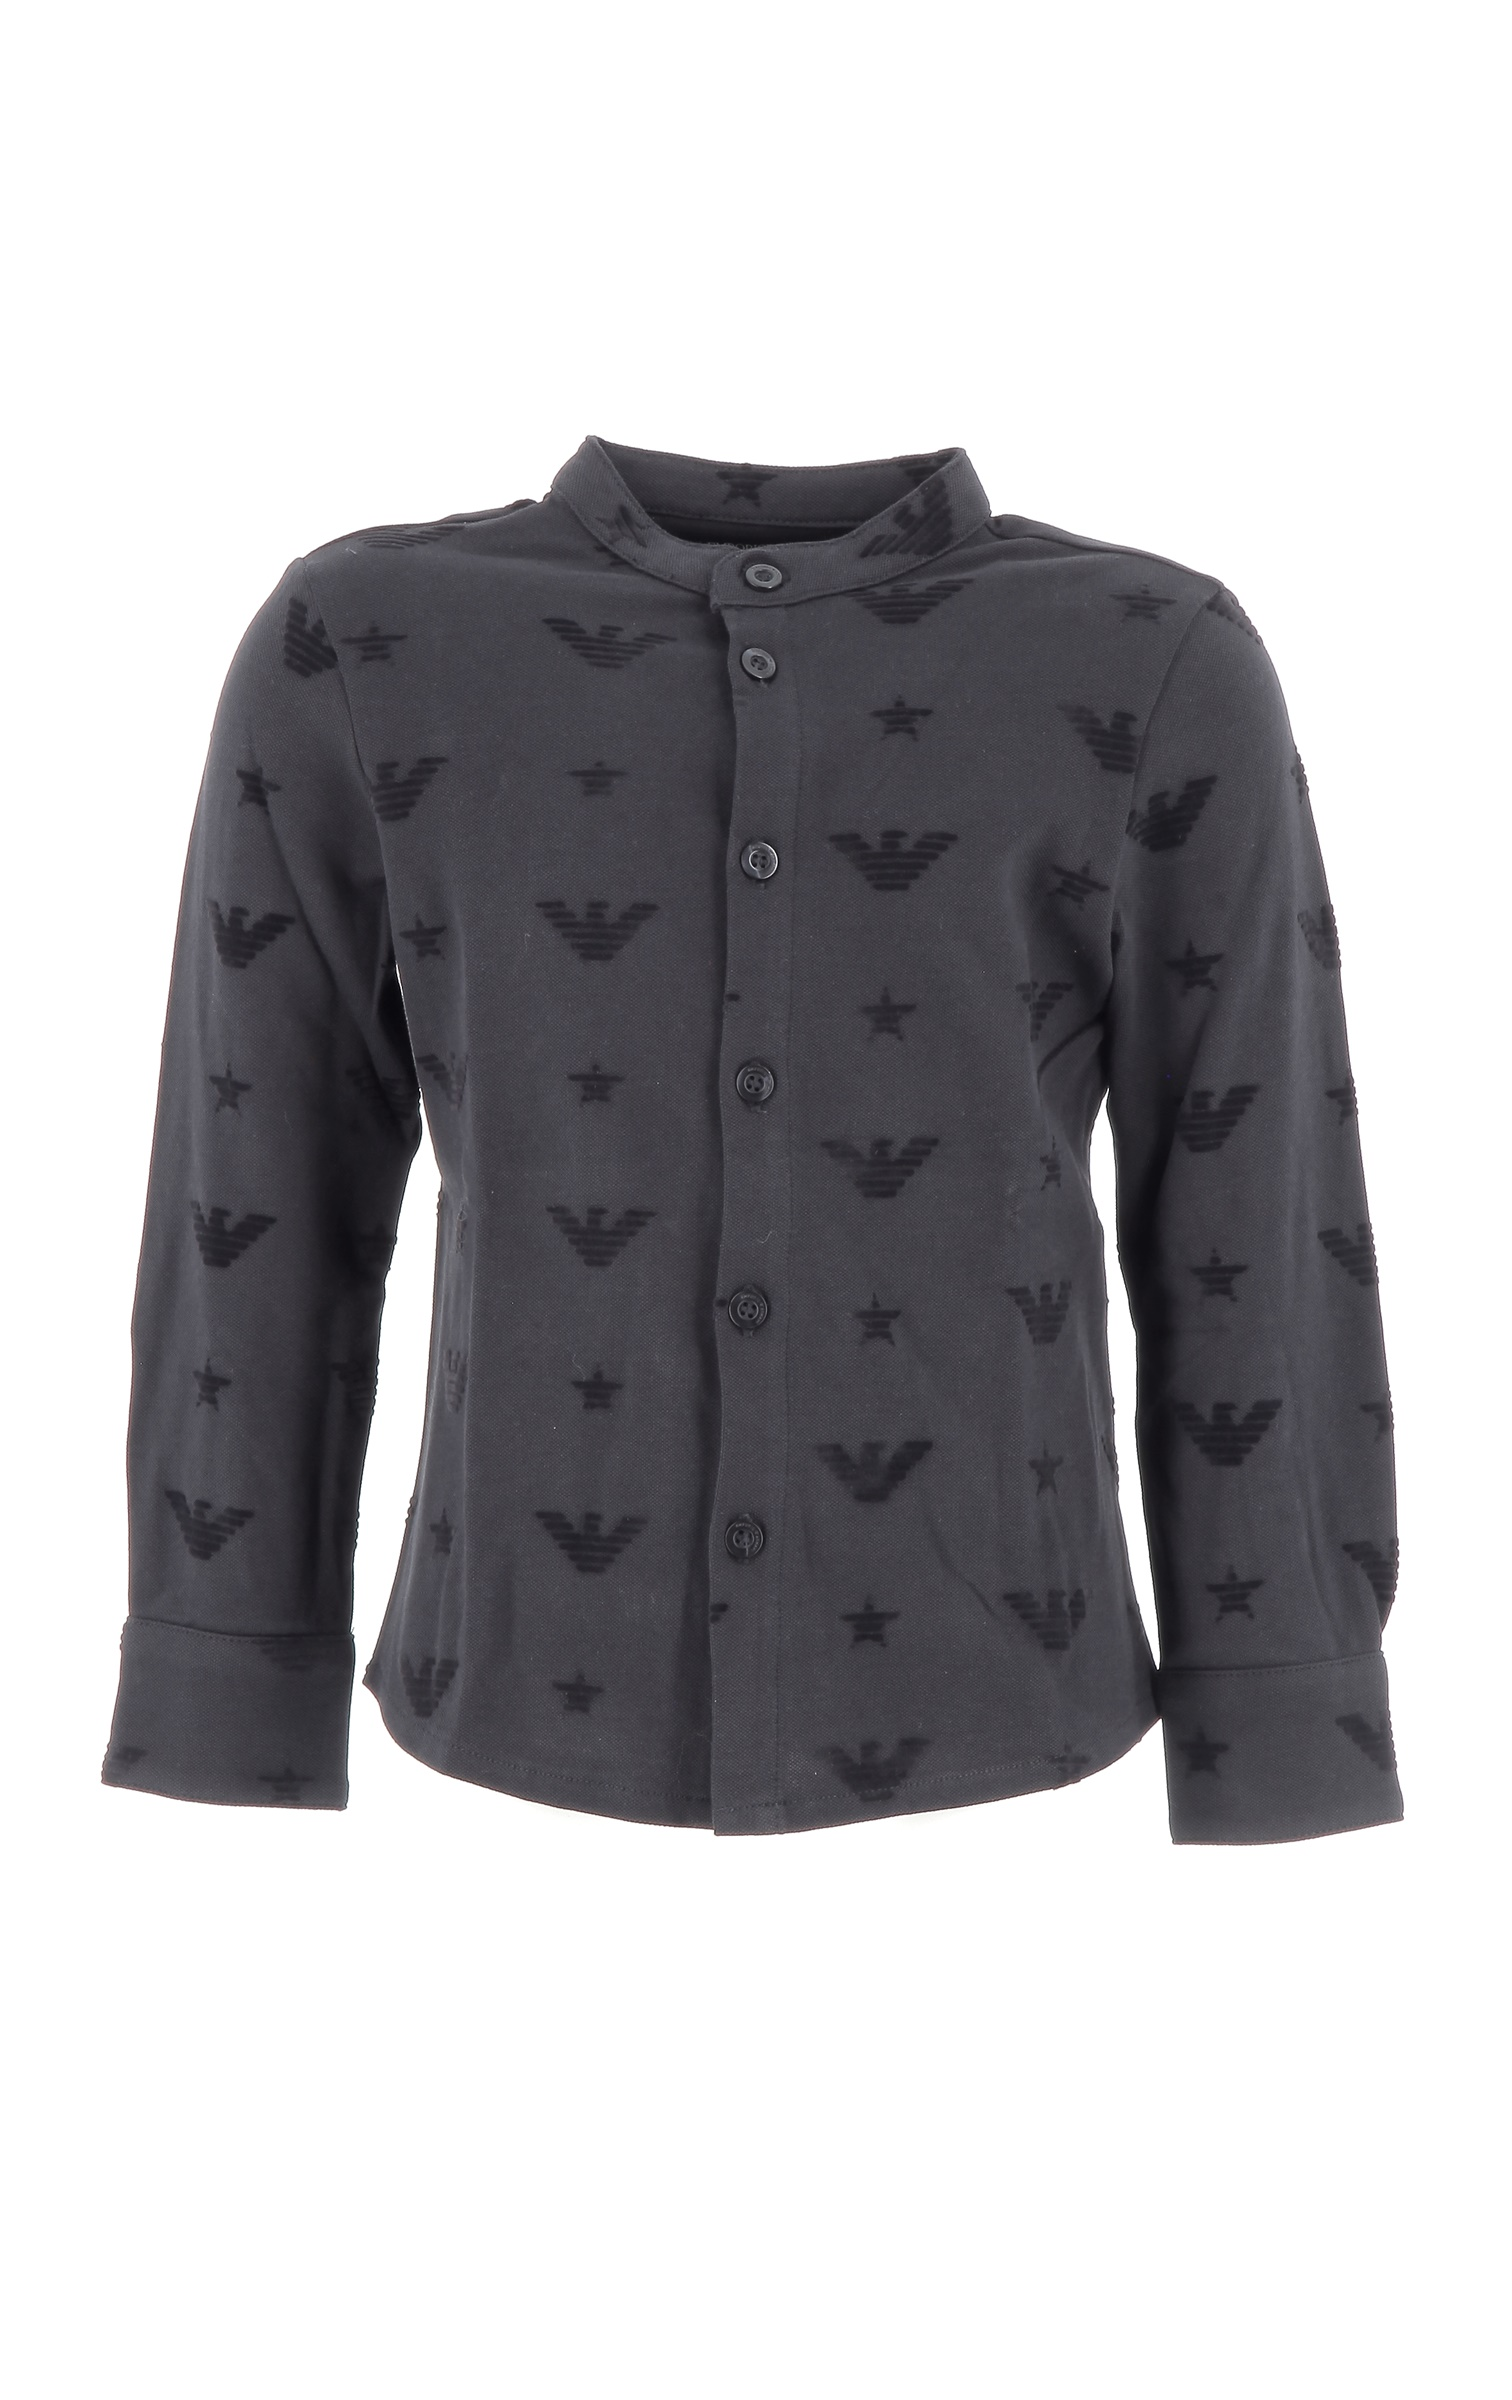 Armani shirt EMPORIO ARMANI | Shirt | 6G4CB21JPTZ0922